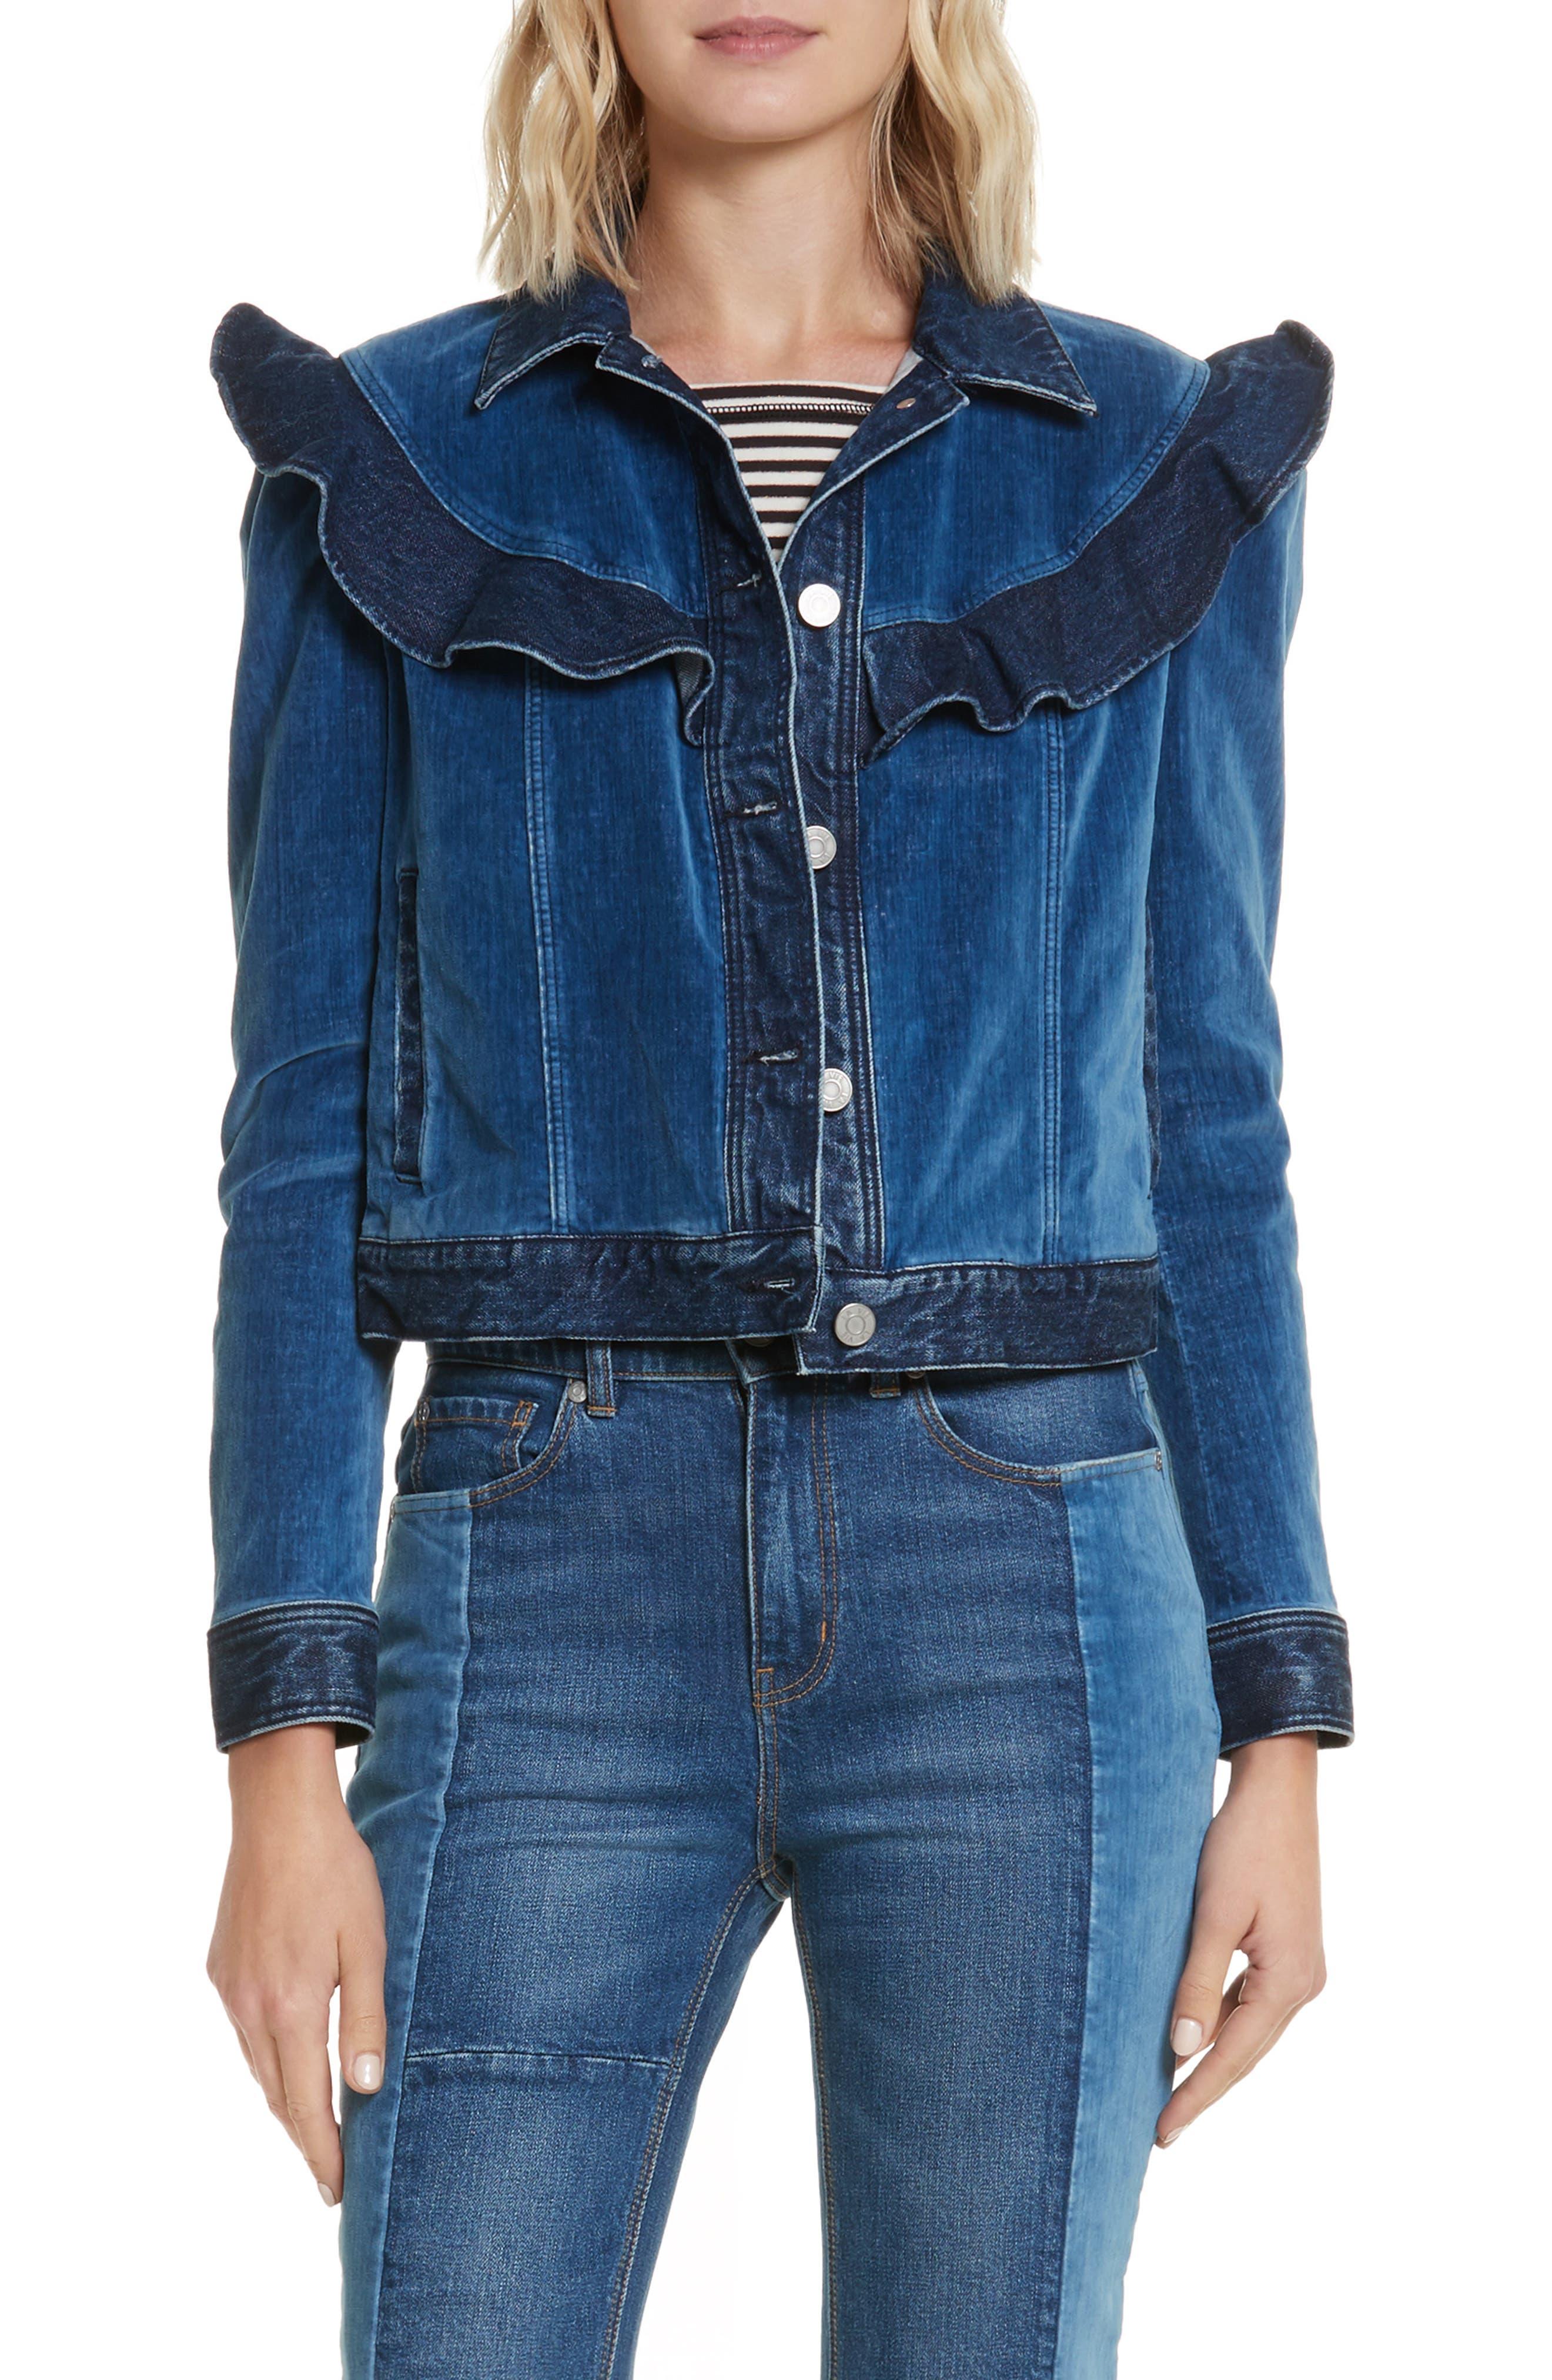 LA VIE REBECCA TAYLOR Velvet Denim Jacket, Main, color, 493